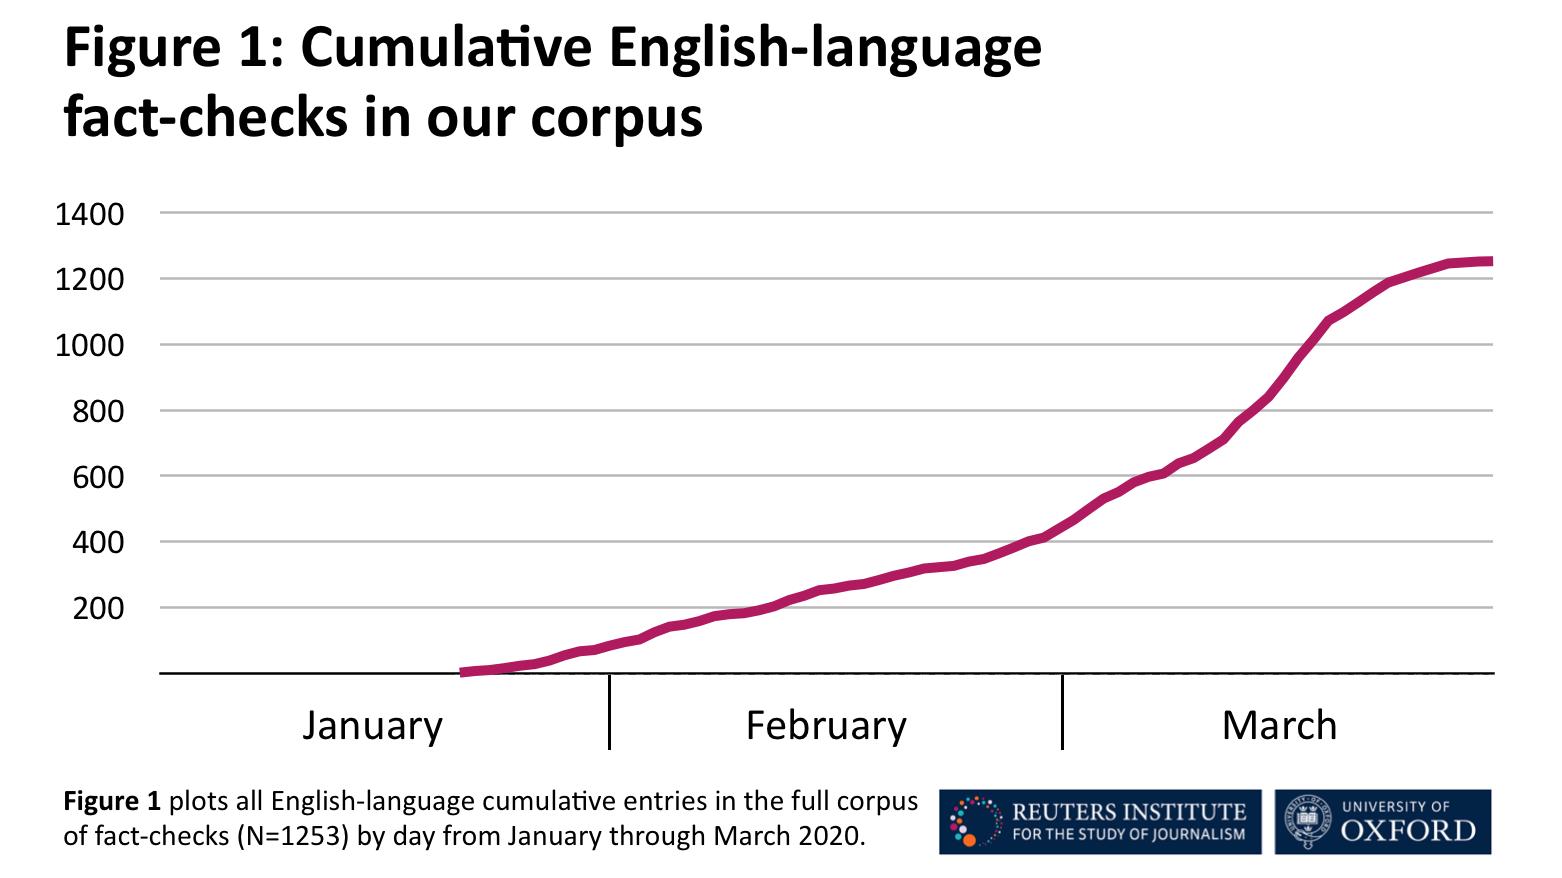 Cumulative English--language fact-checks in our corpus